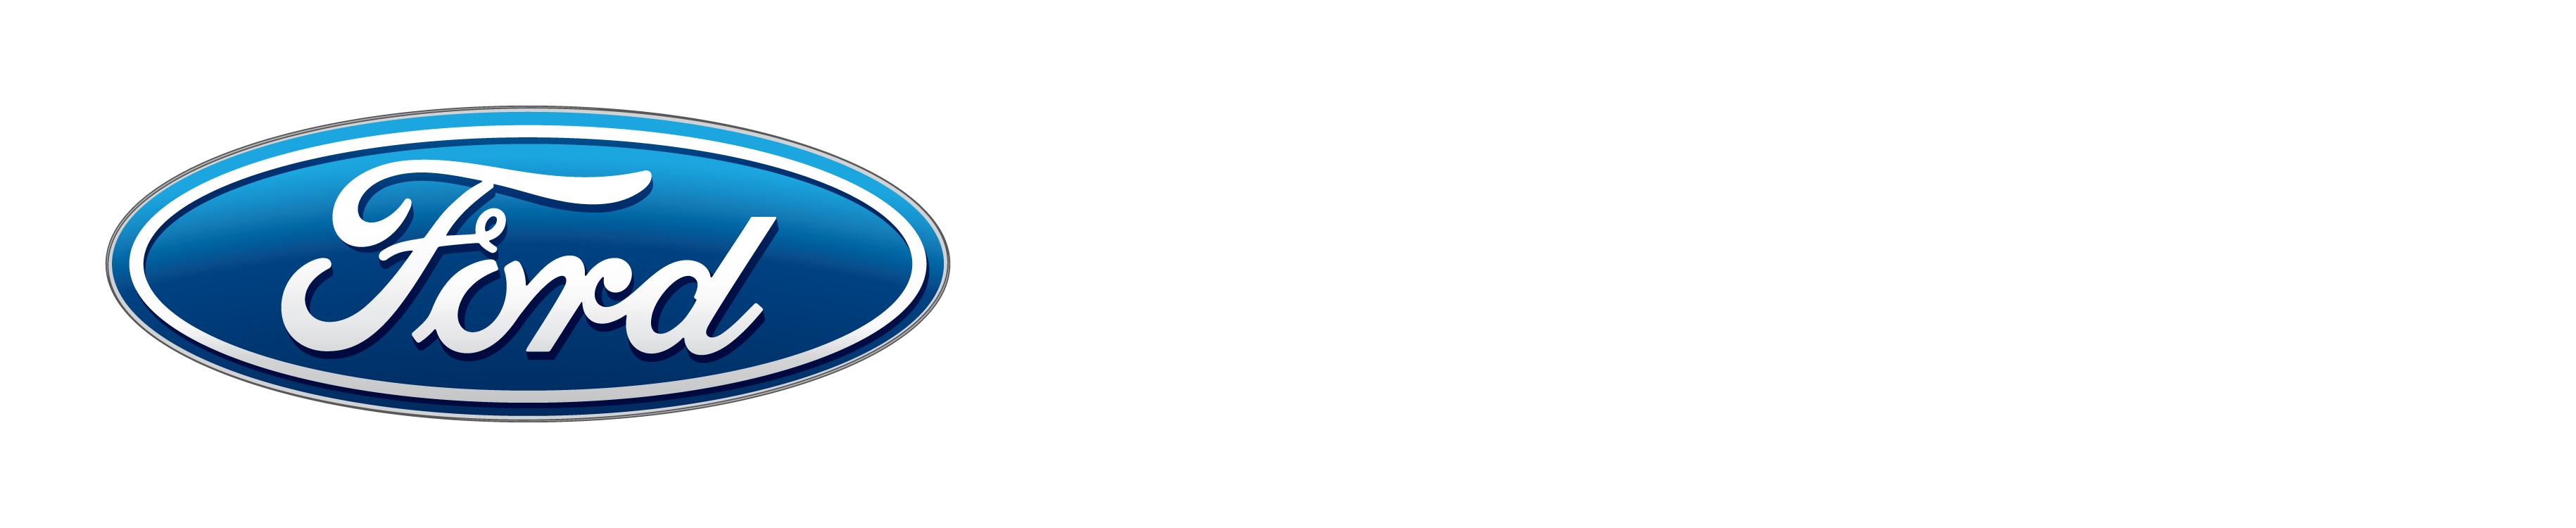 Duval Ford logo